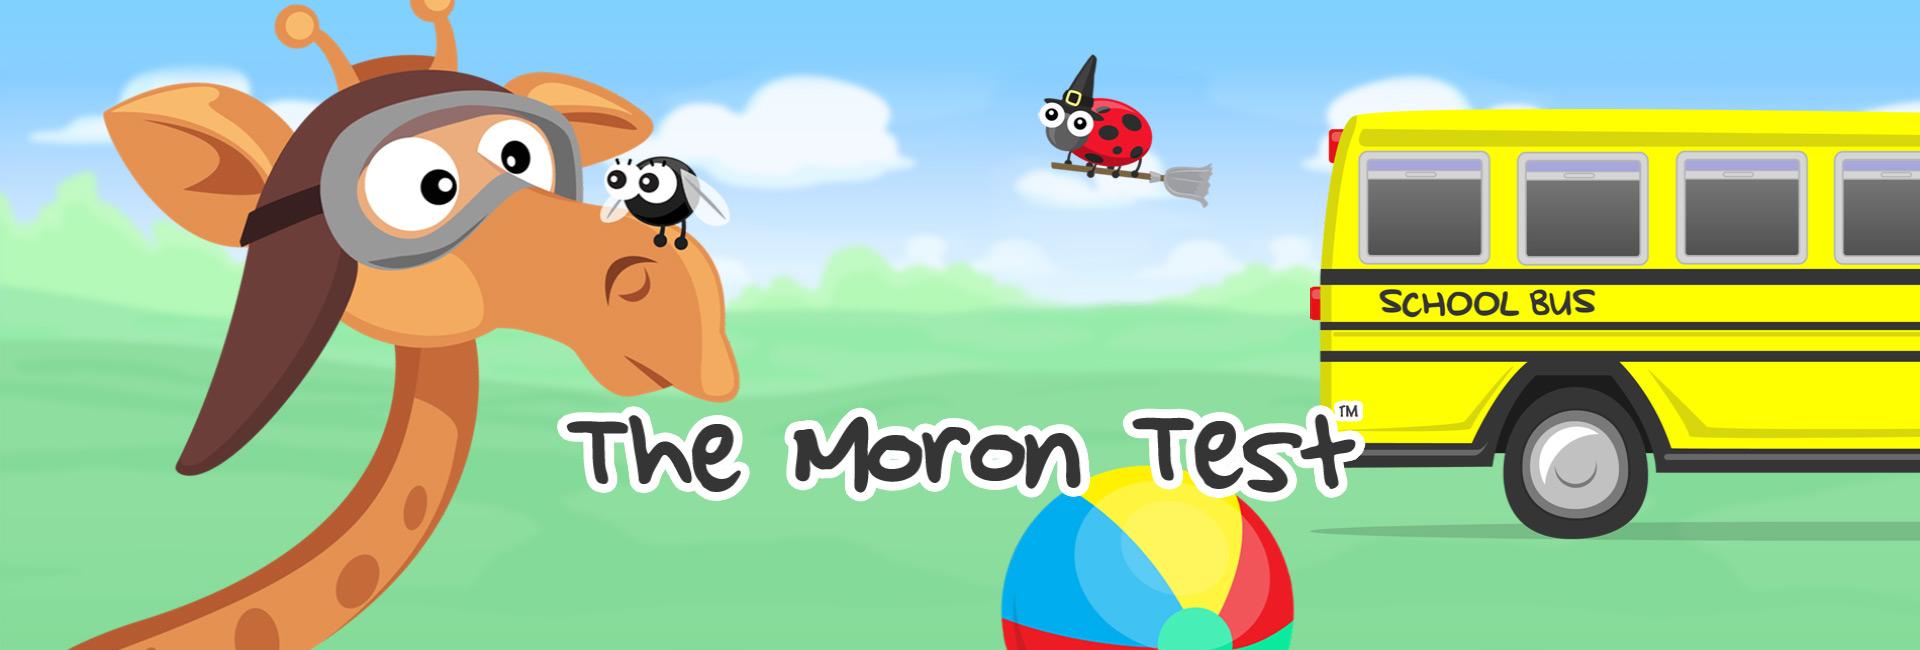 moron test answers skip day